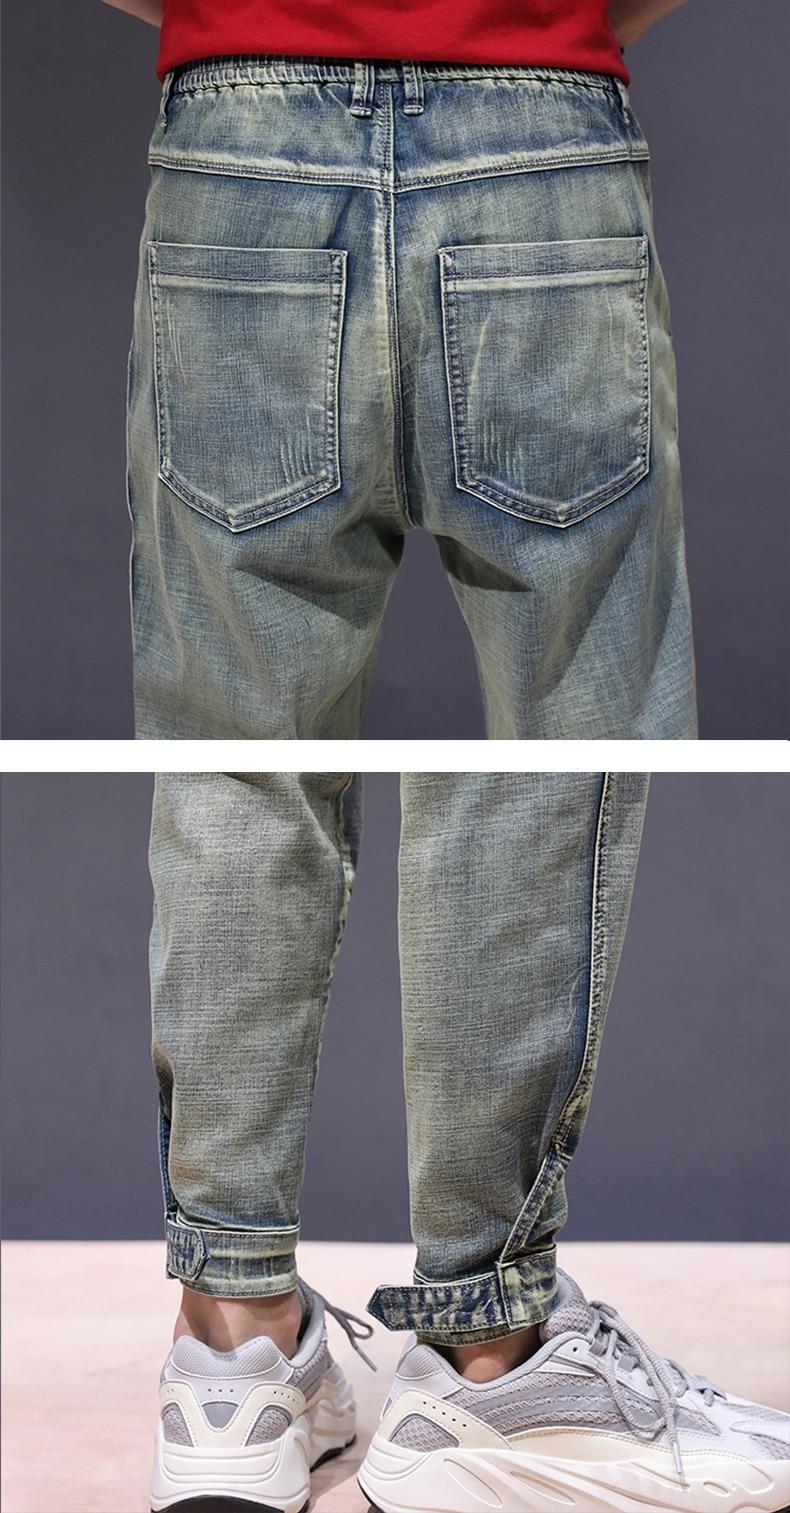 KSTUN Mens Jeans 2020 New Arrivals Retro Blue Elastic Waist Drawstring Baggy Legs Jogger Jeans Man Casaul Denim Pants Streetwear 16